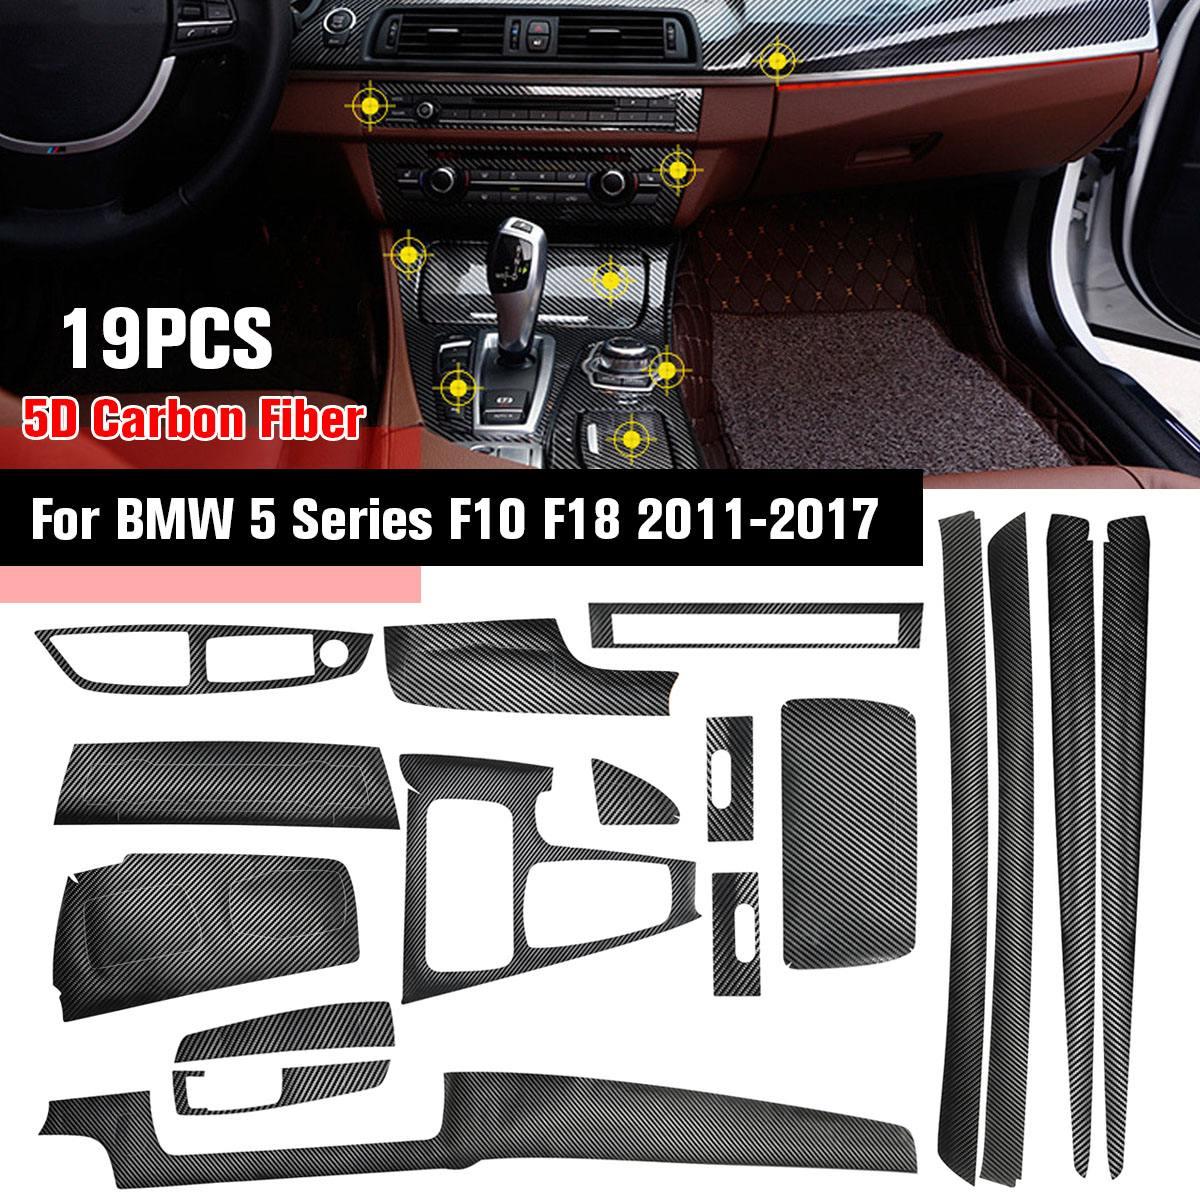 Glossy Reflective 5D Carbon Fiber Interior Sticker Vinyl Interior Decal Trim For BMW 5 Series F10 F18 2011-2017 19Pcs